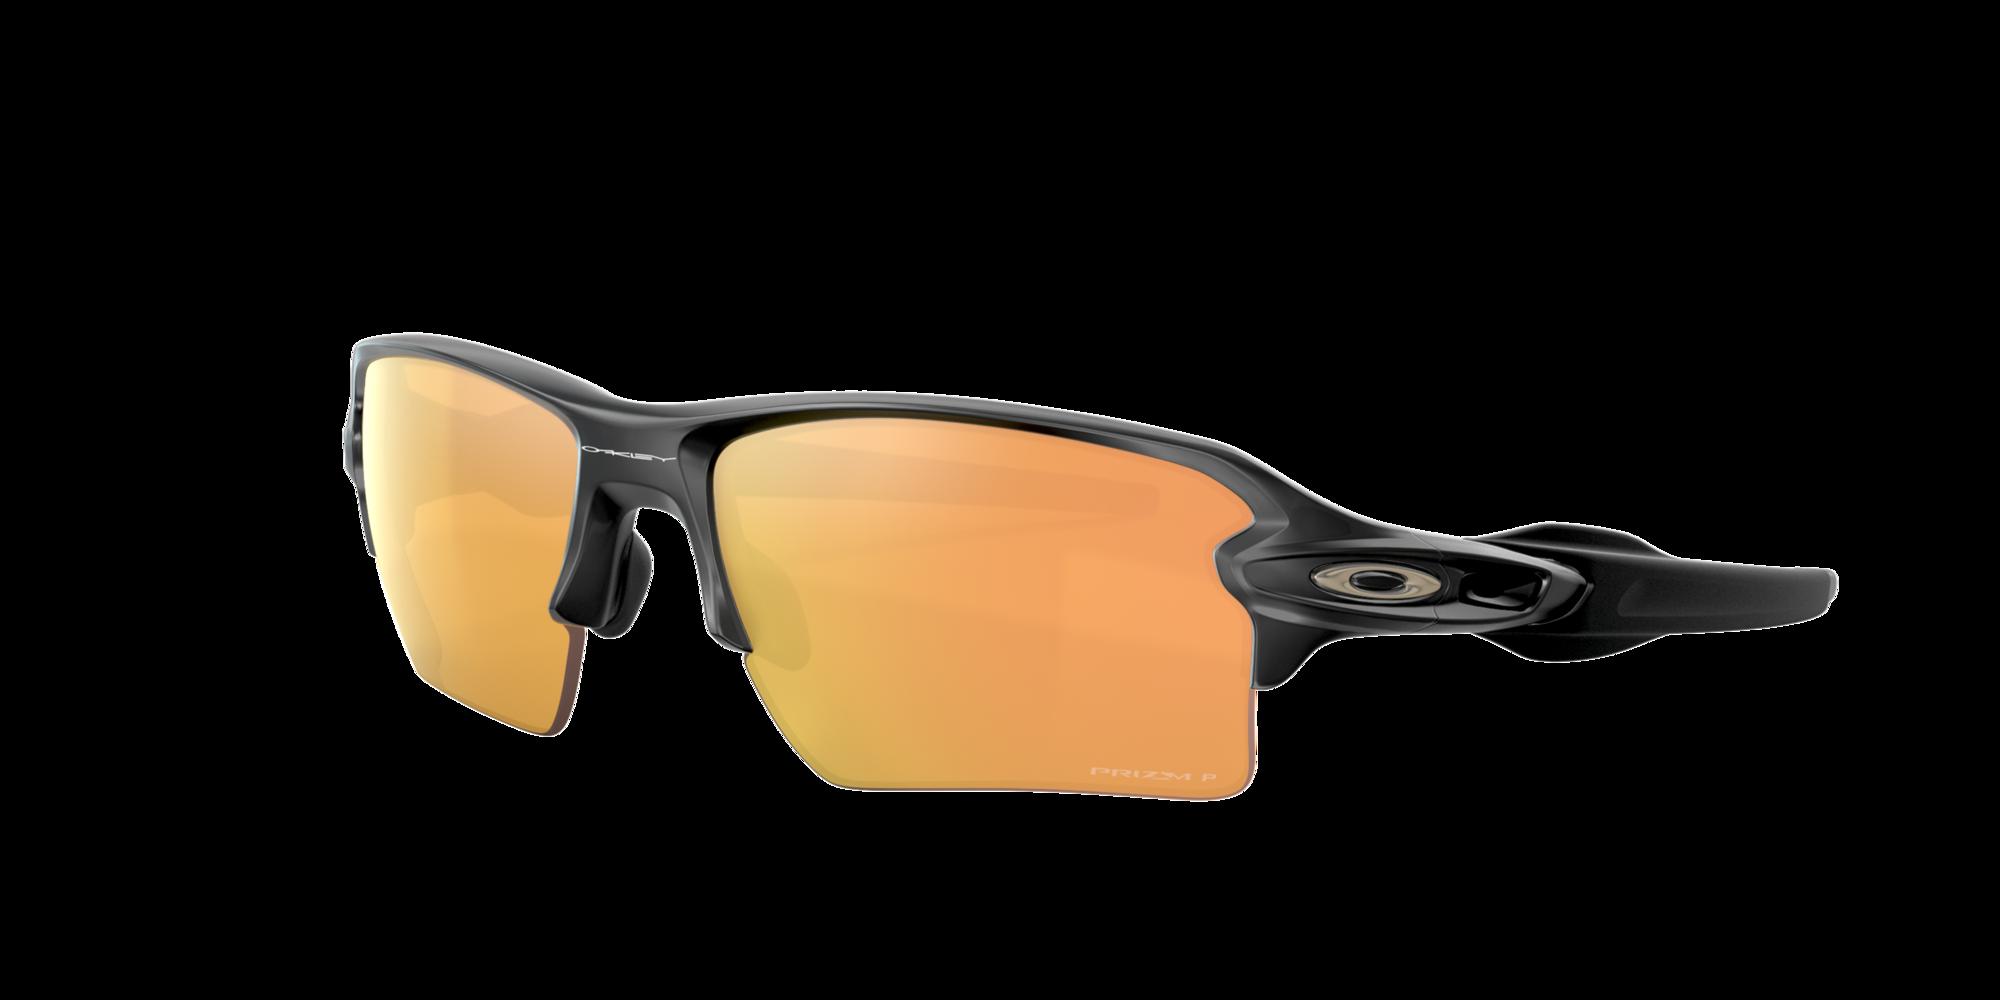 Oakley Man  OO9188 Flak™ 2.0 XL -  Frame color: Black, Lens color: Orange, Size FA-LS/133